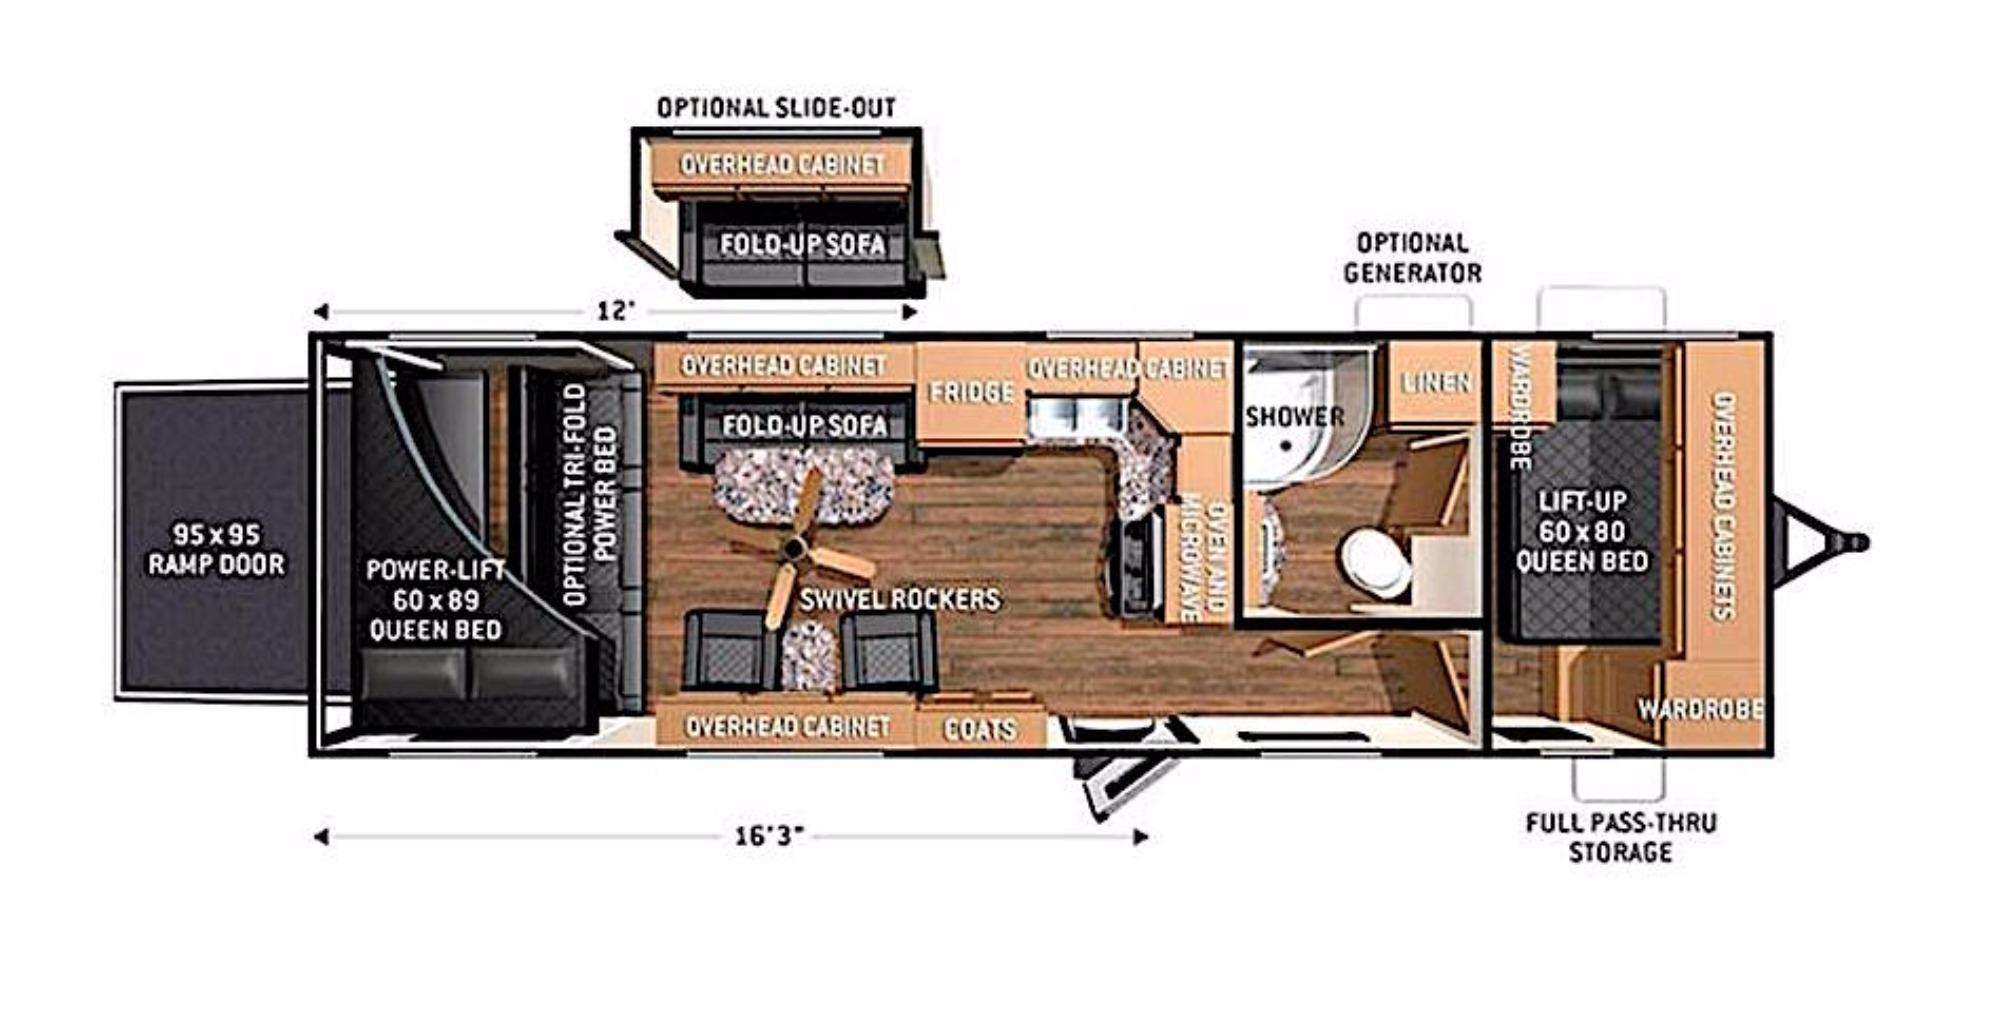 2016 Cruiser Rv Stryker 2812 1223569 on Pioneer Floor Plan